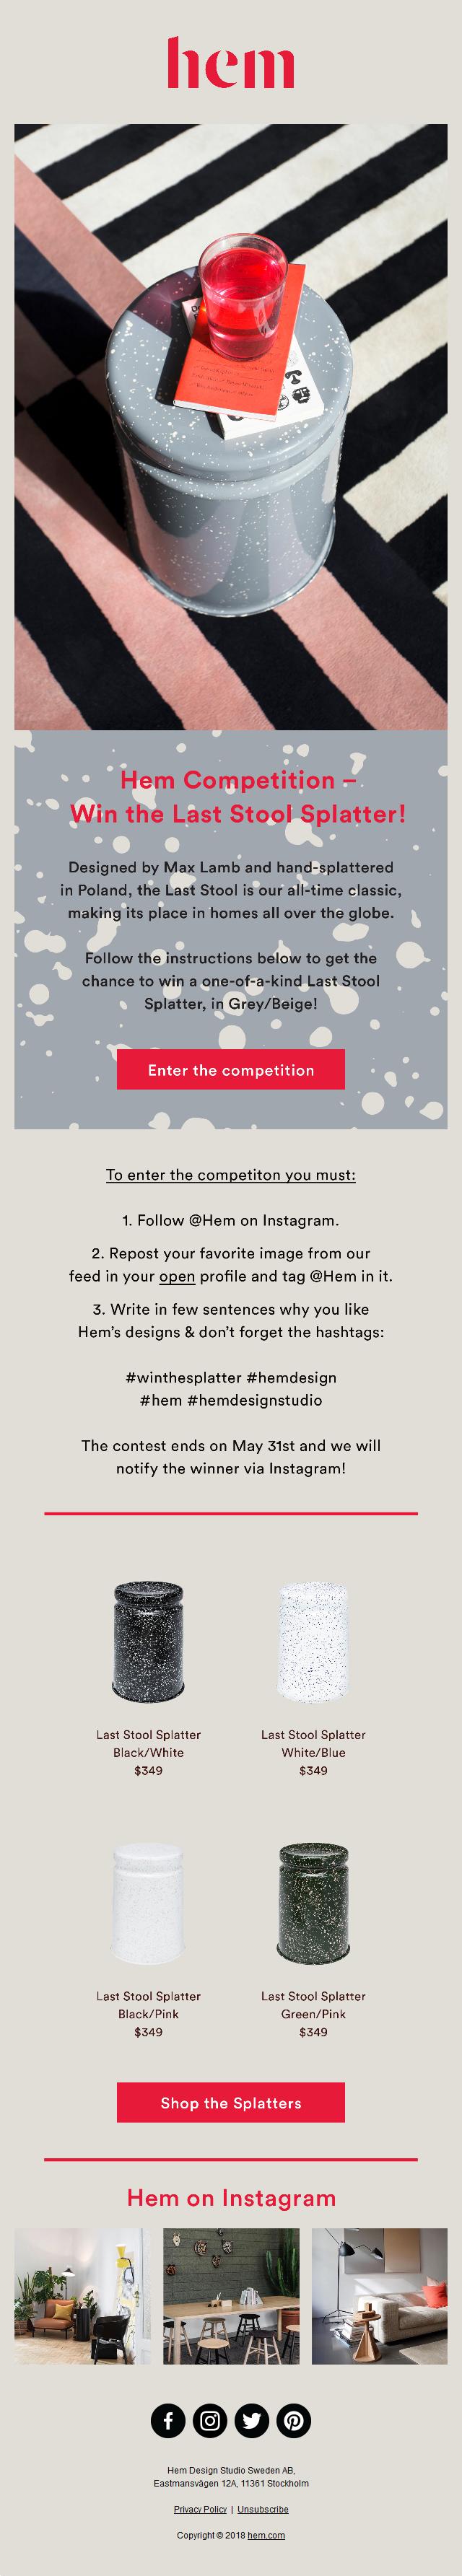 Hem Competition – Win the Last Stool Splatter!